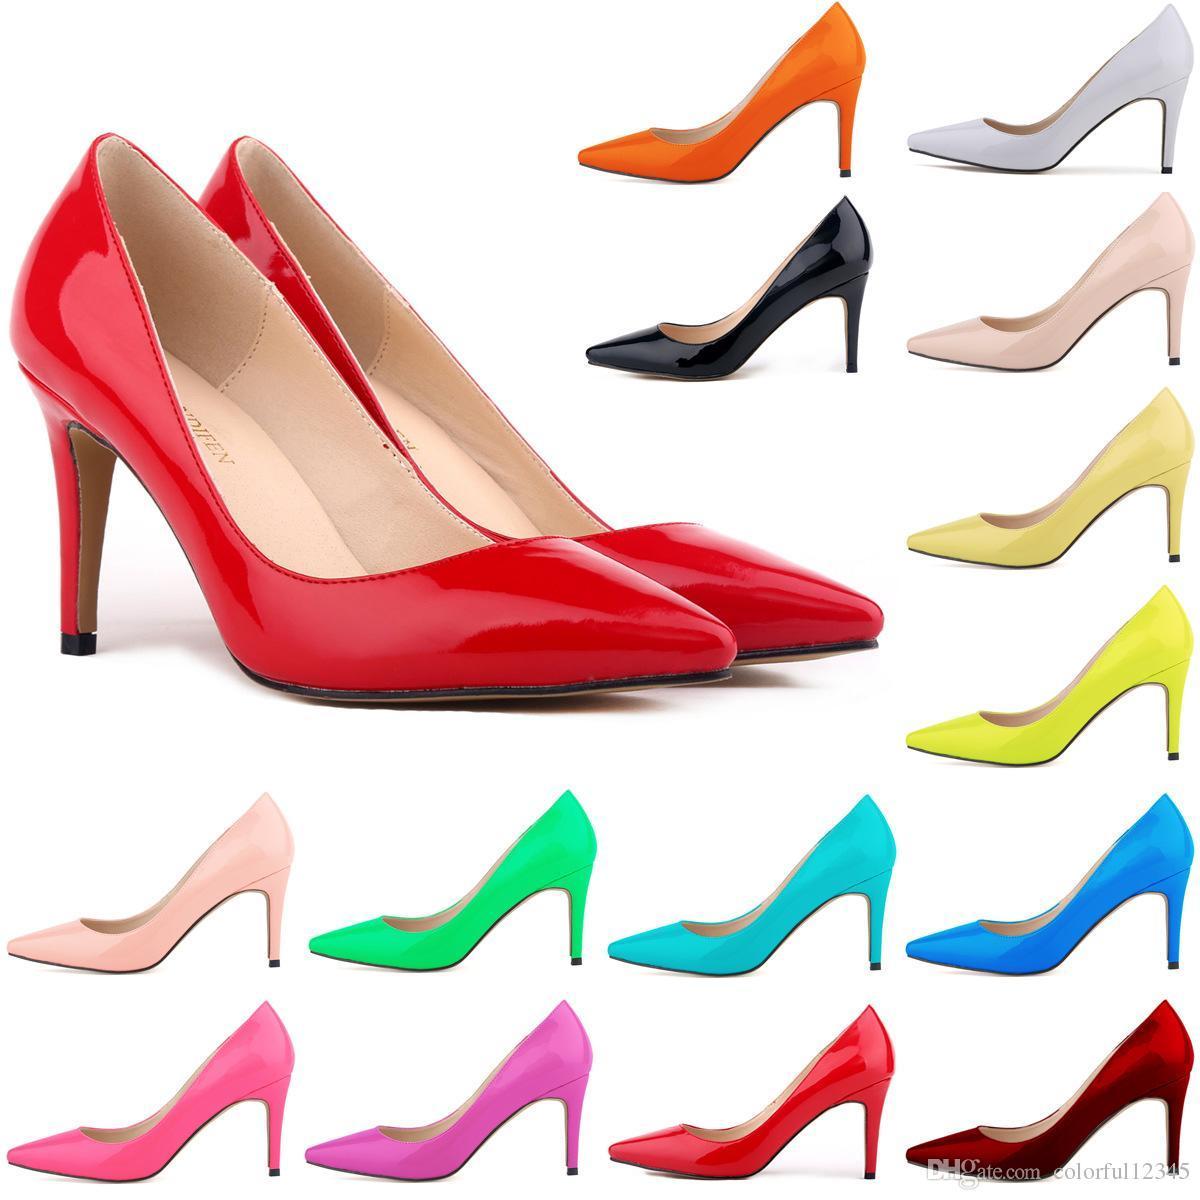 2017 neue Zapatos Mujer Frauen Lackleder Mid High Heels Spitz Korsett Pumps Pumps